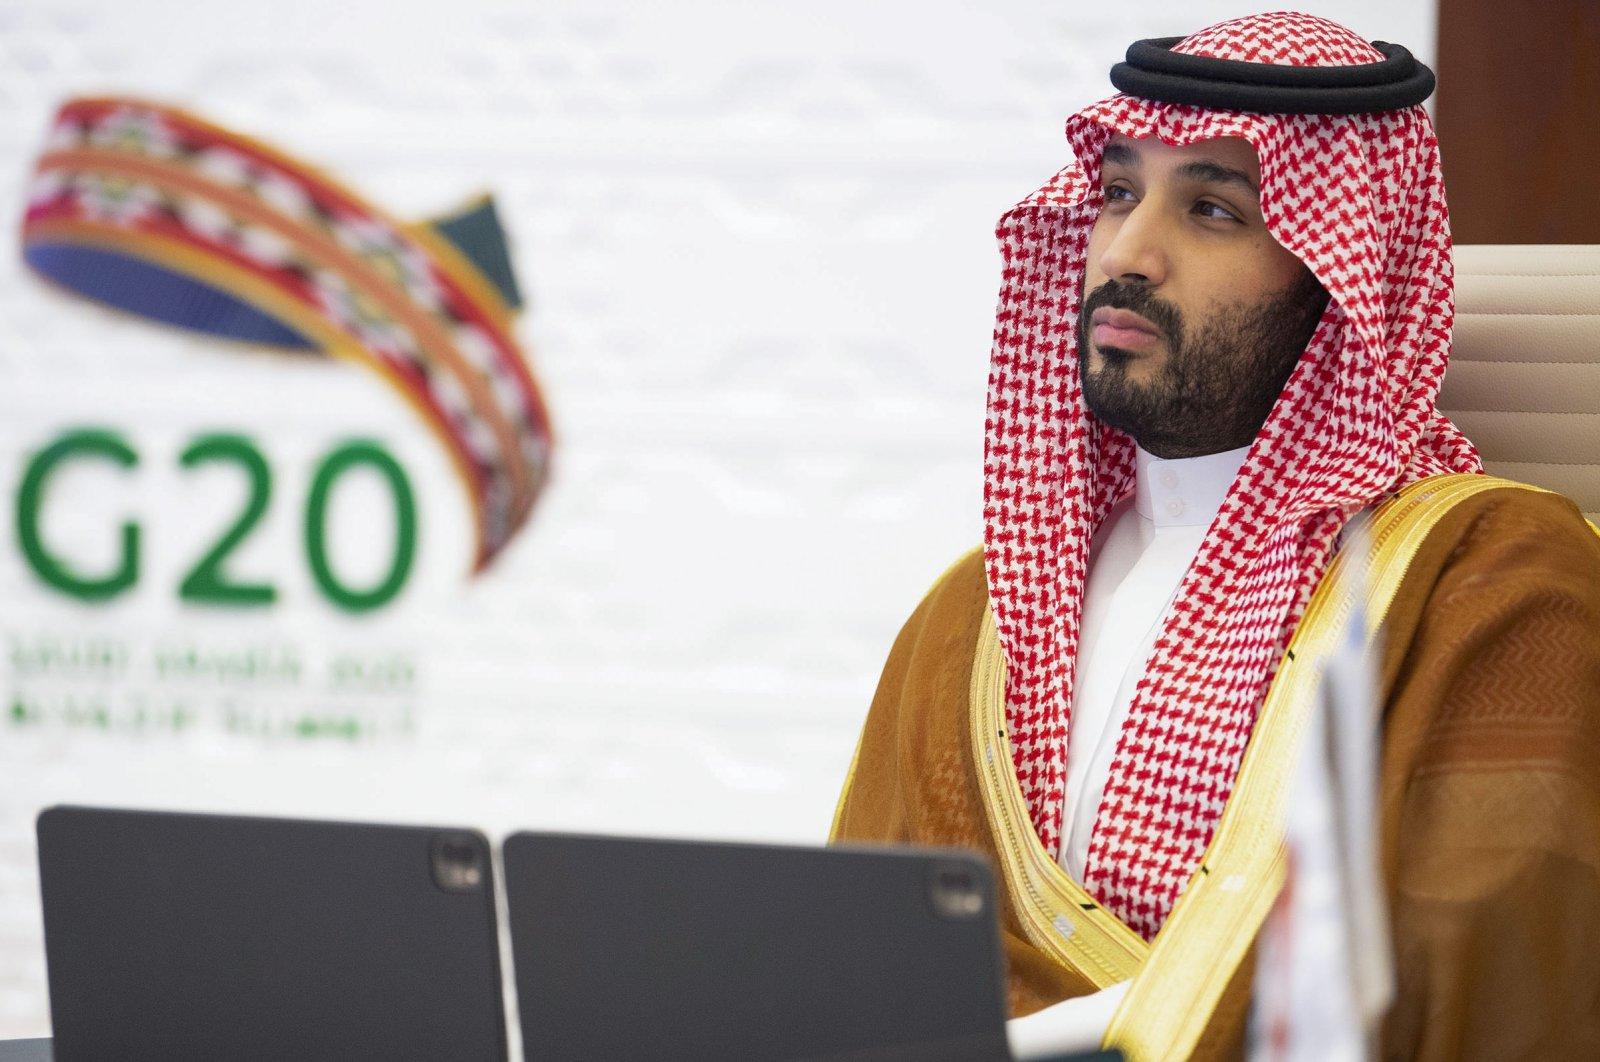 A handout picture provided by the Saudi Royal Palace on Nov. 21, 2020, shows Saudi Crown Prince Mohammed bin Salman attending the G20 summit, held virtually due to the COVID-19 coronavirus pandemic, in the capital Riyadh. (Bandar Al-Jaloud/ Saudi Royal Palace via AFP)